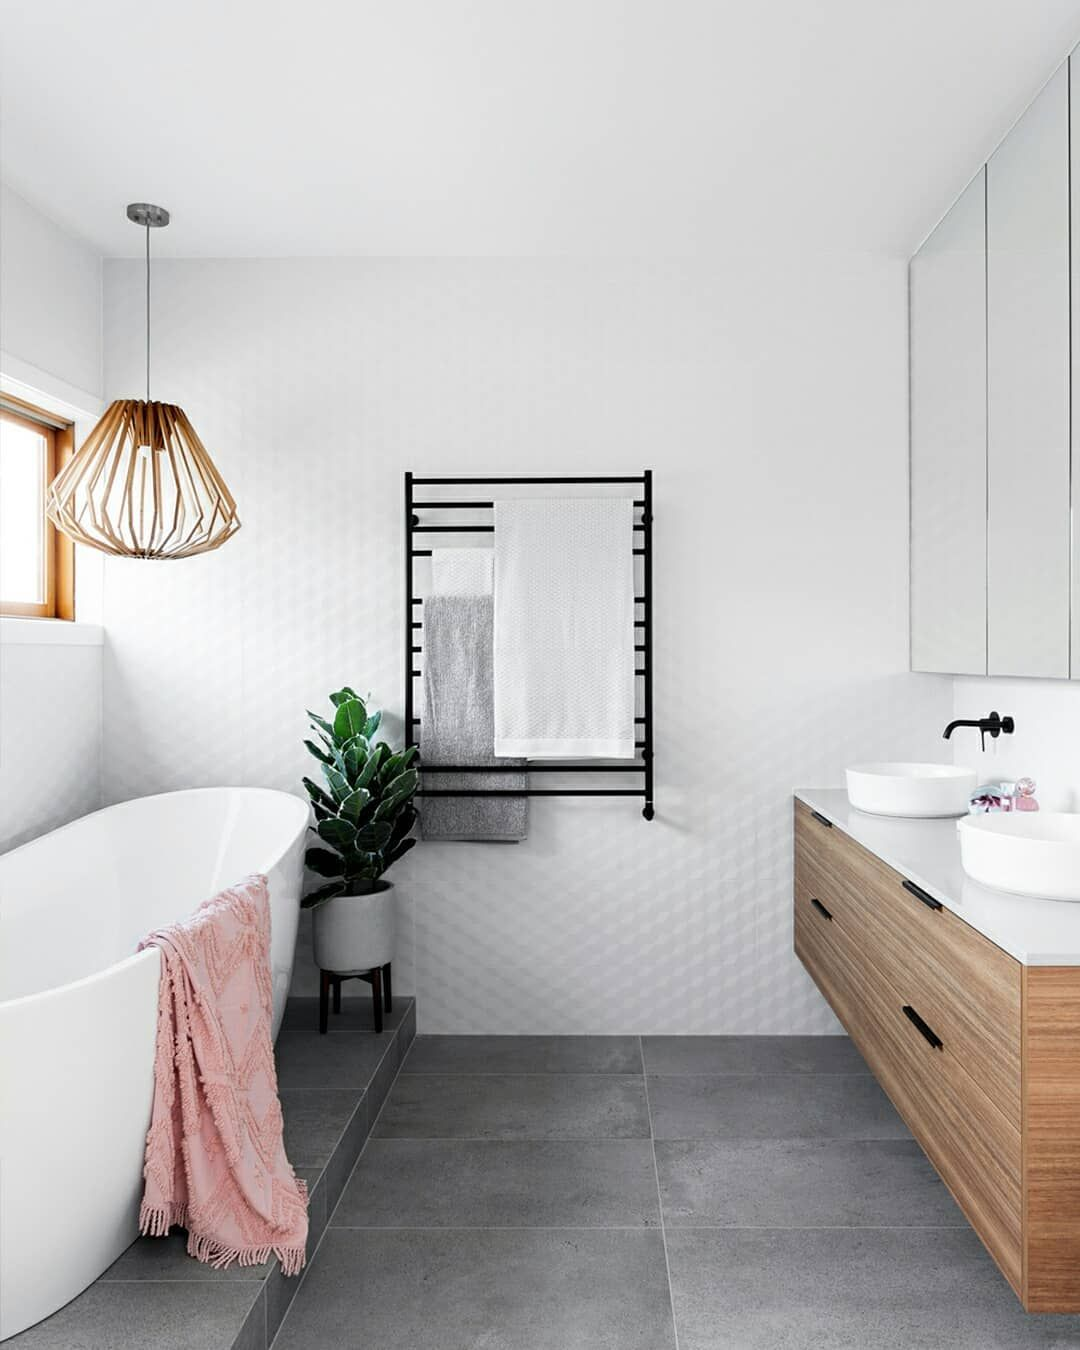 10 Best Bathroom Remodel Ideas On A Budget That Will Inspire You Reece Bathroom Easy Bathroom Decorating Modern Bathroom Remodel